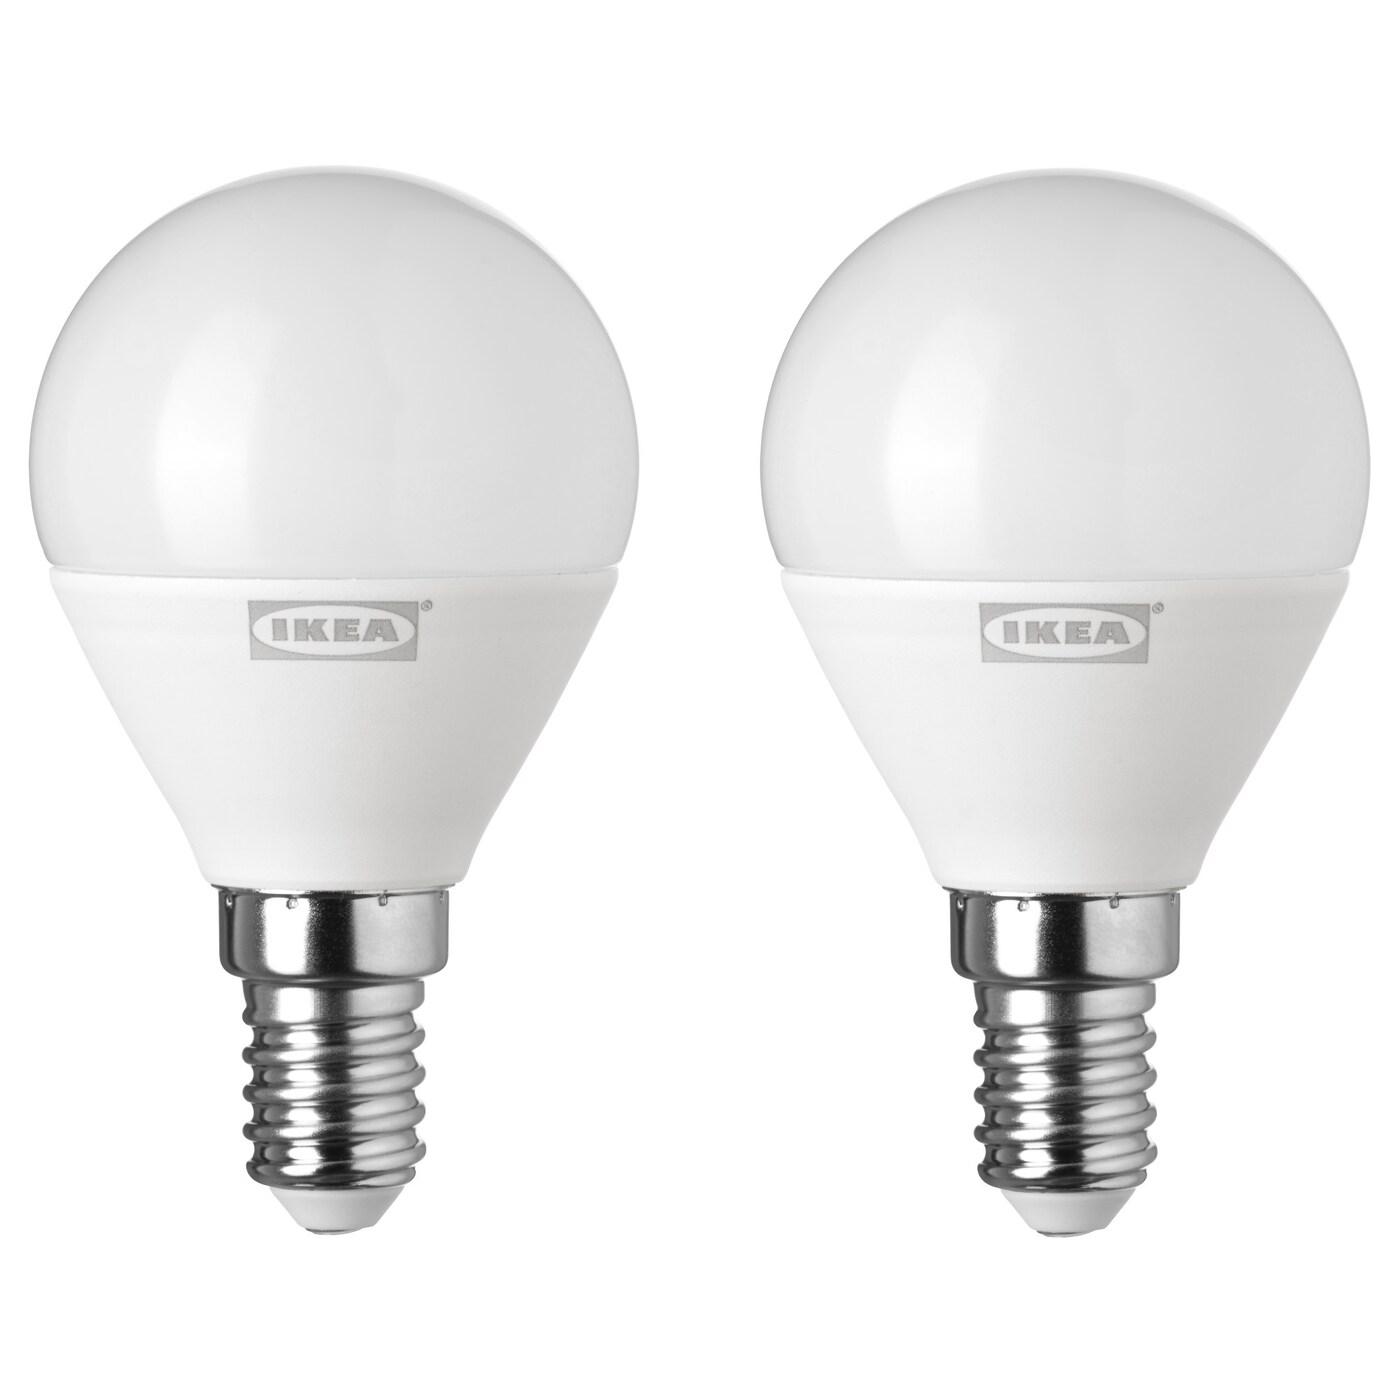 ryet ampoule led e14 400 lumen globe opalin ikea. Black Bedroom Furniture Sets. Home Design Ideas